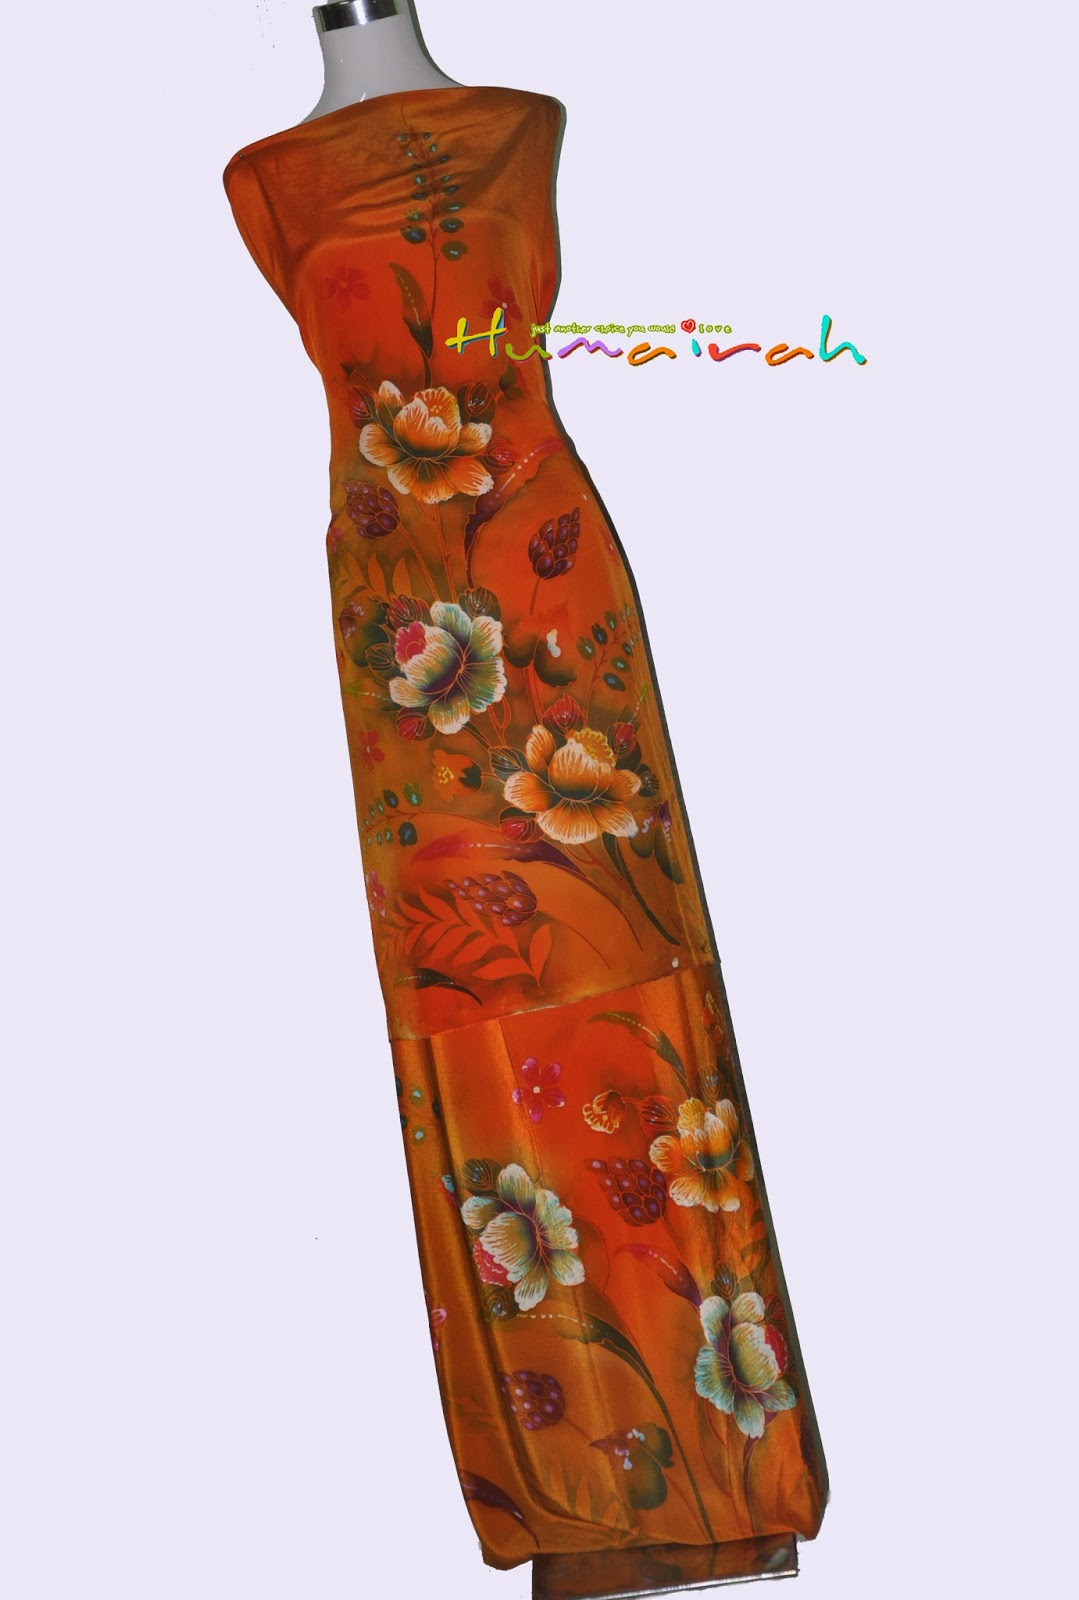 CX79 - Batik Sutera Handmade Exclusive Bunga Ros Oren 42